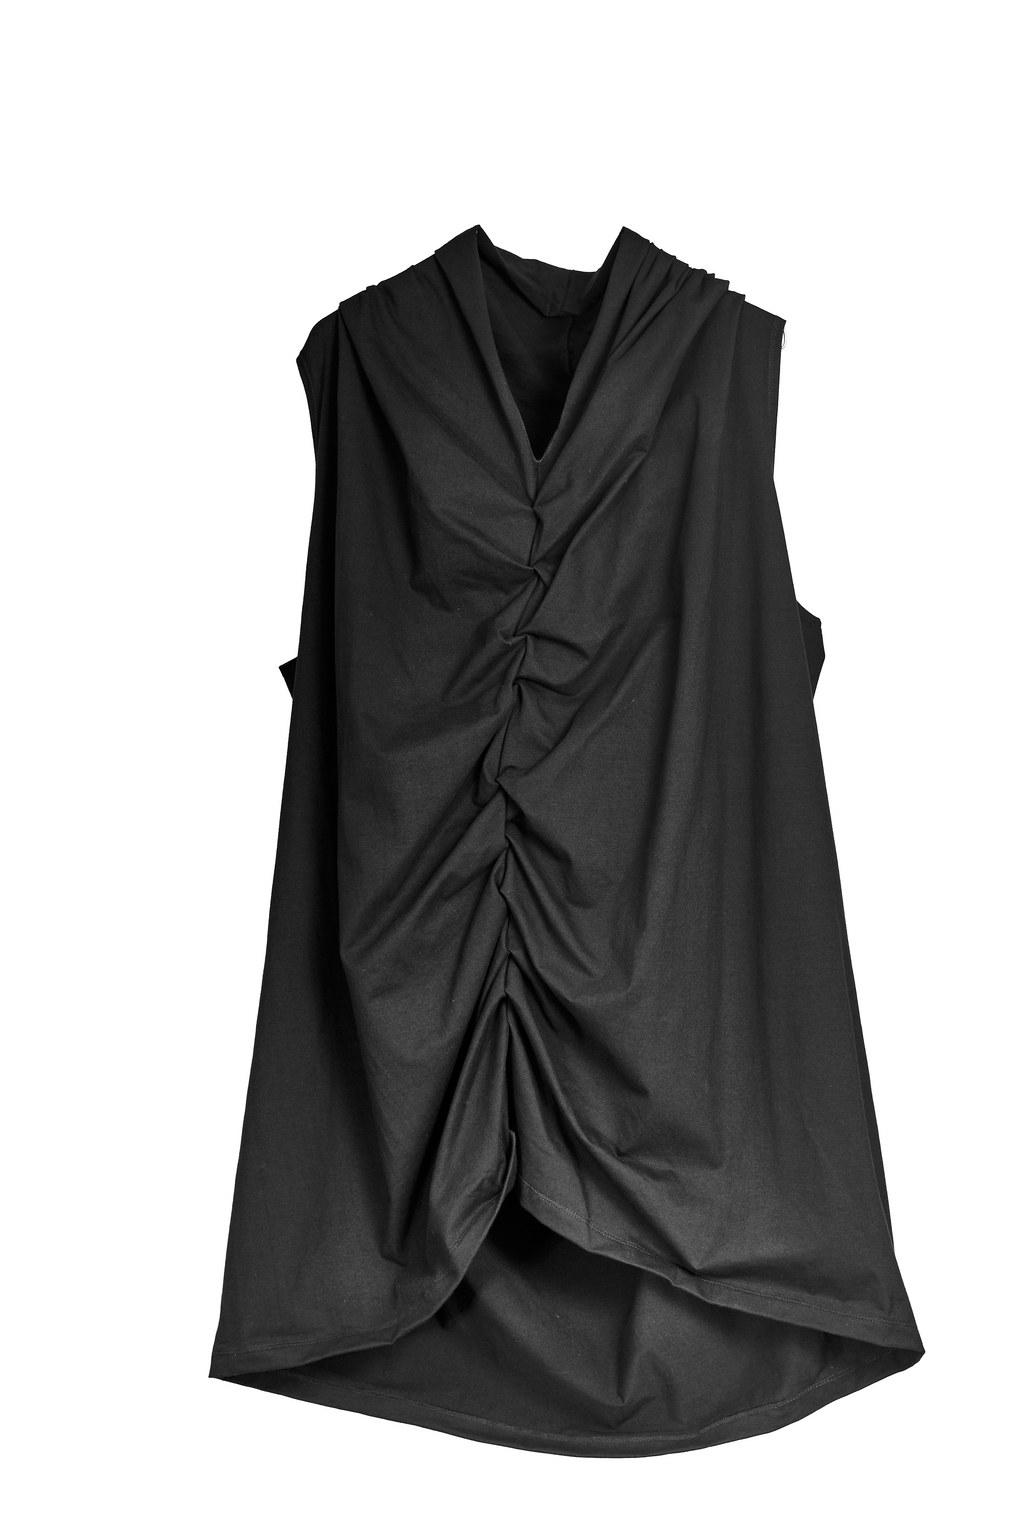 JERSEY FOLD DRESS